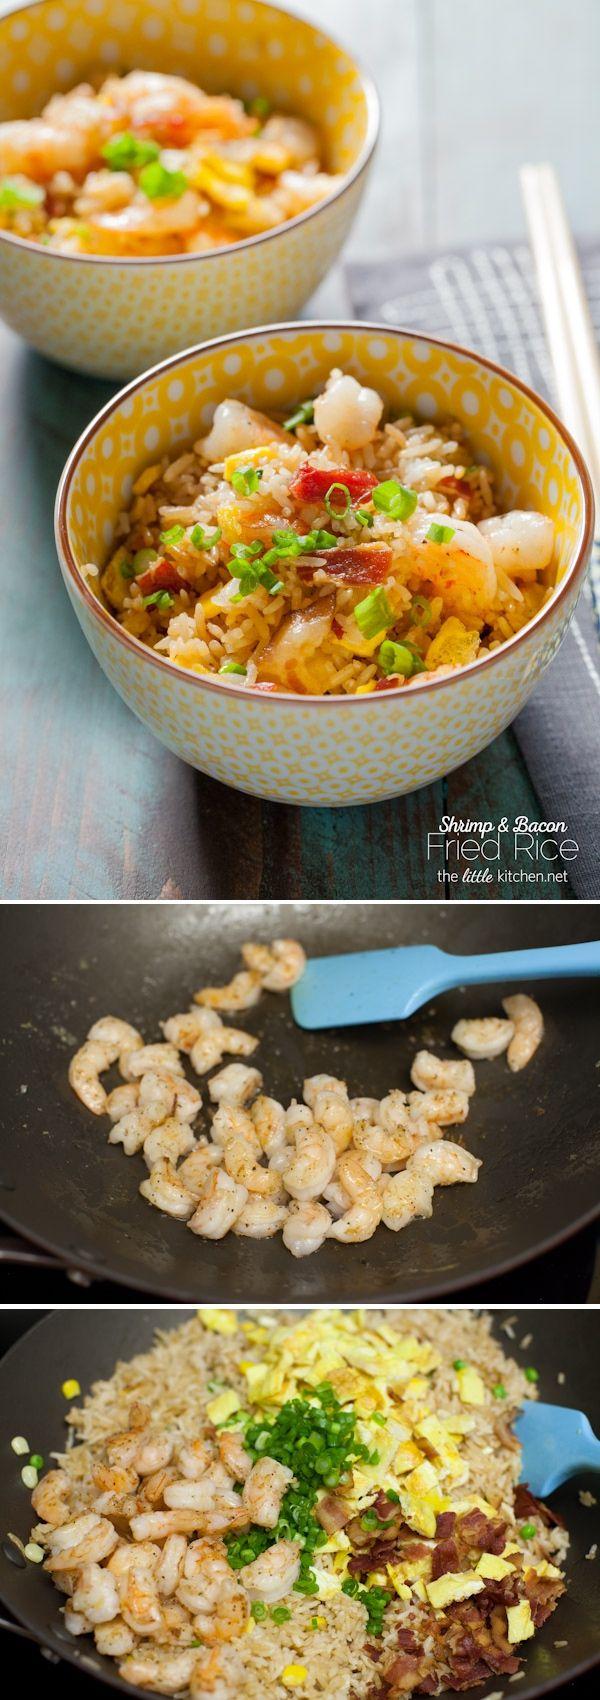 Shrimp & Bacon Fried Rice